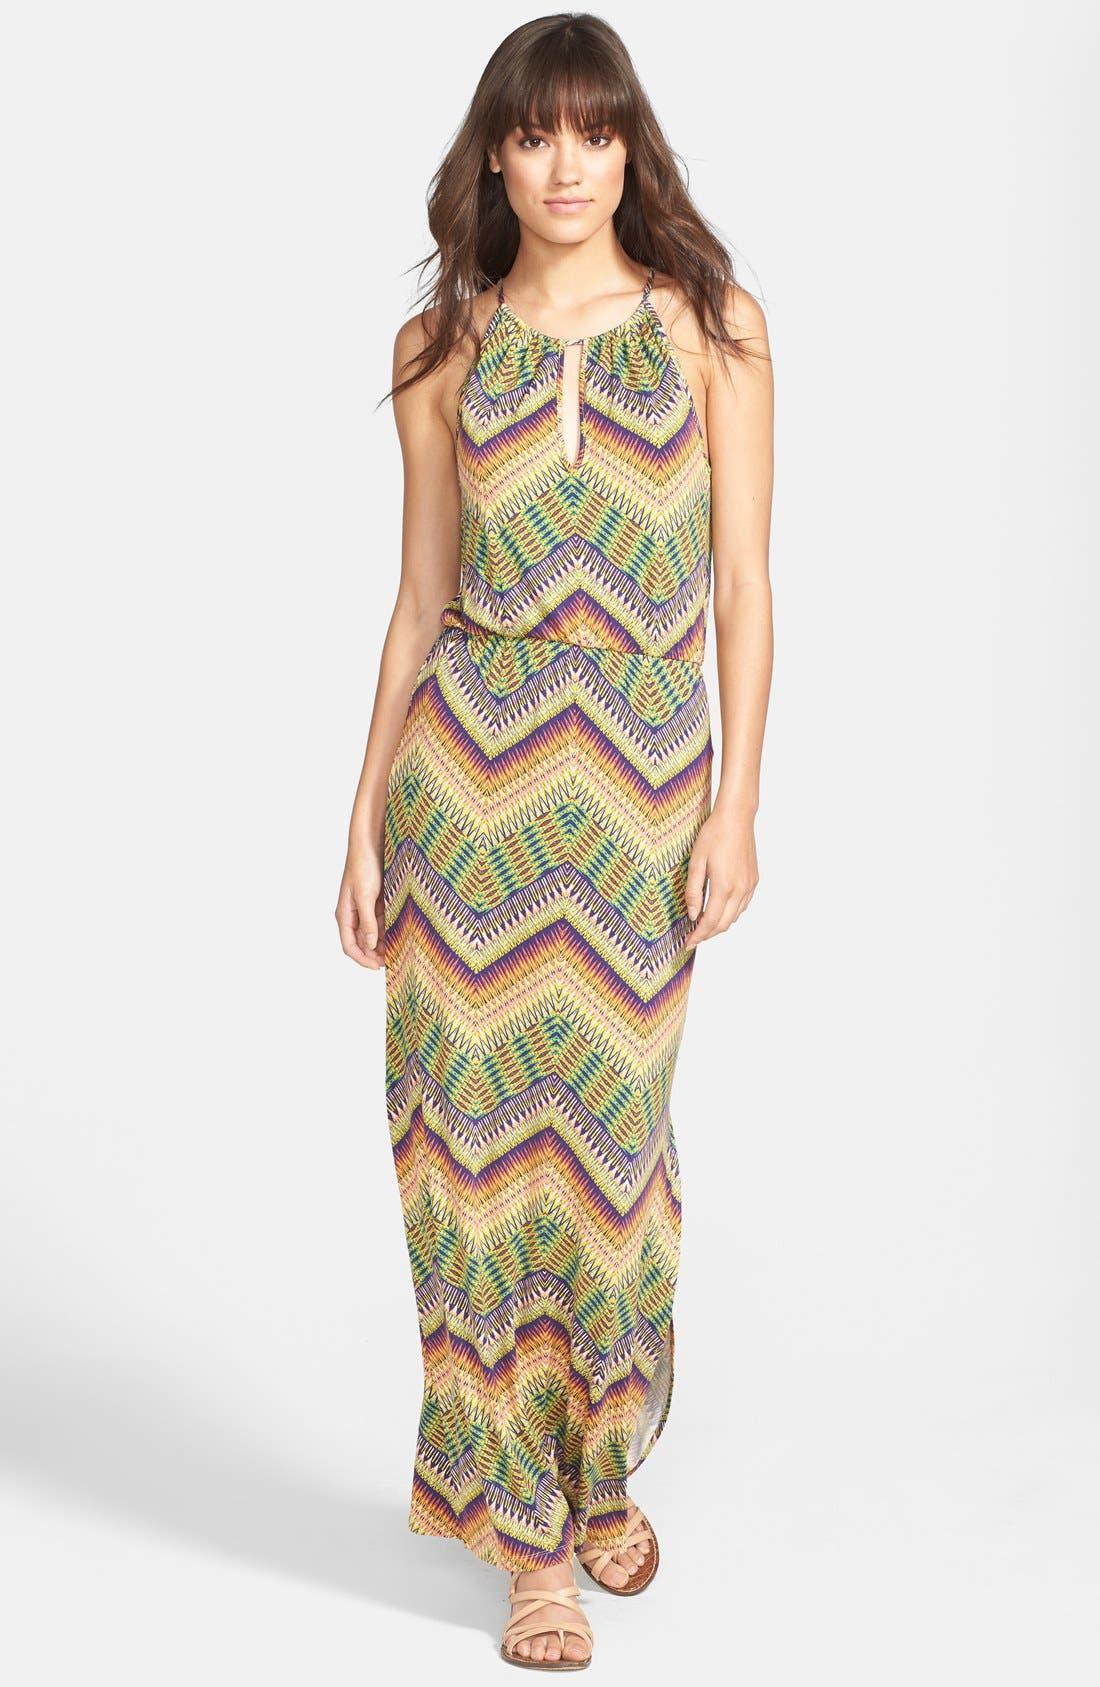 Main Image - Sanctuary 'Island' Chevron Print Cutout Maxi Dress